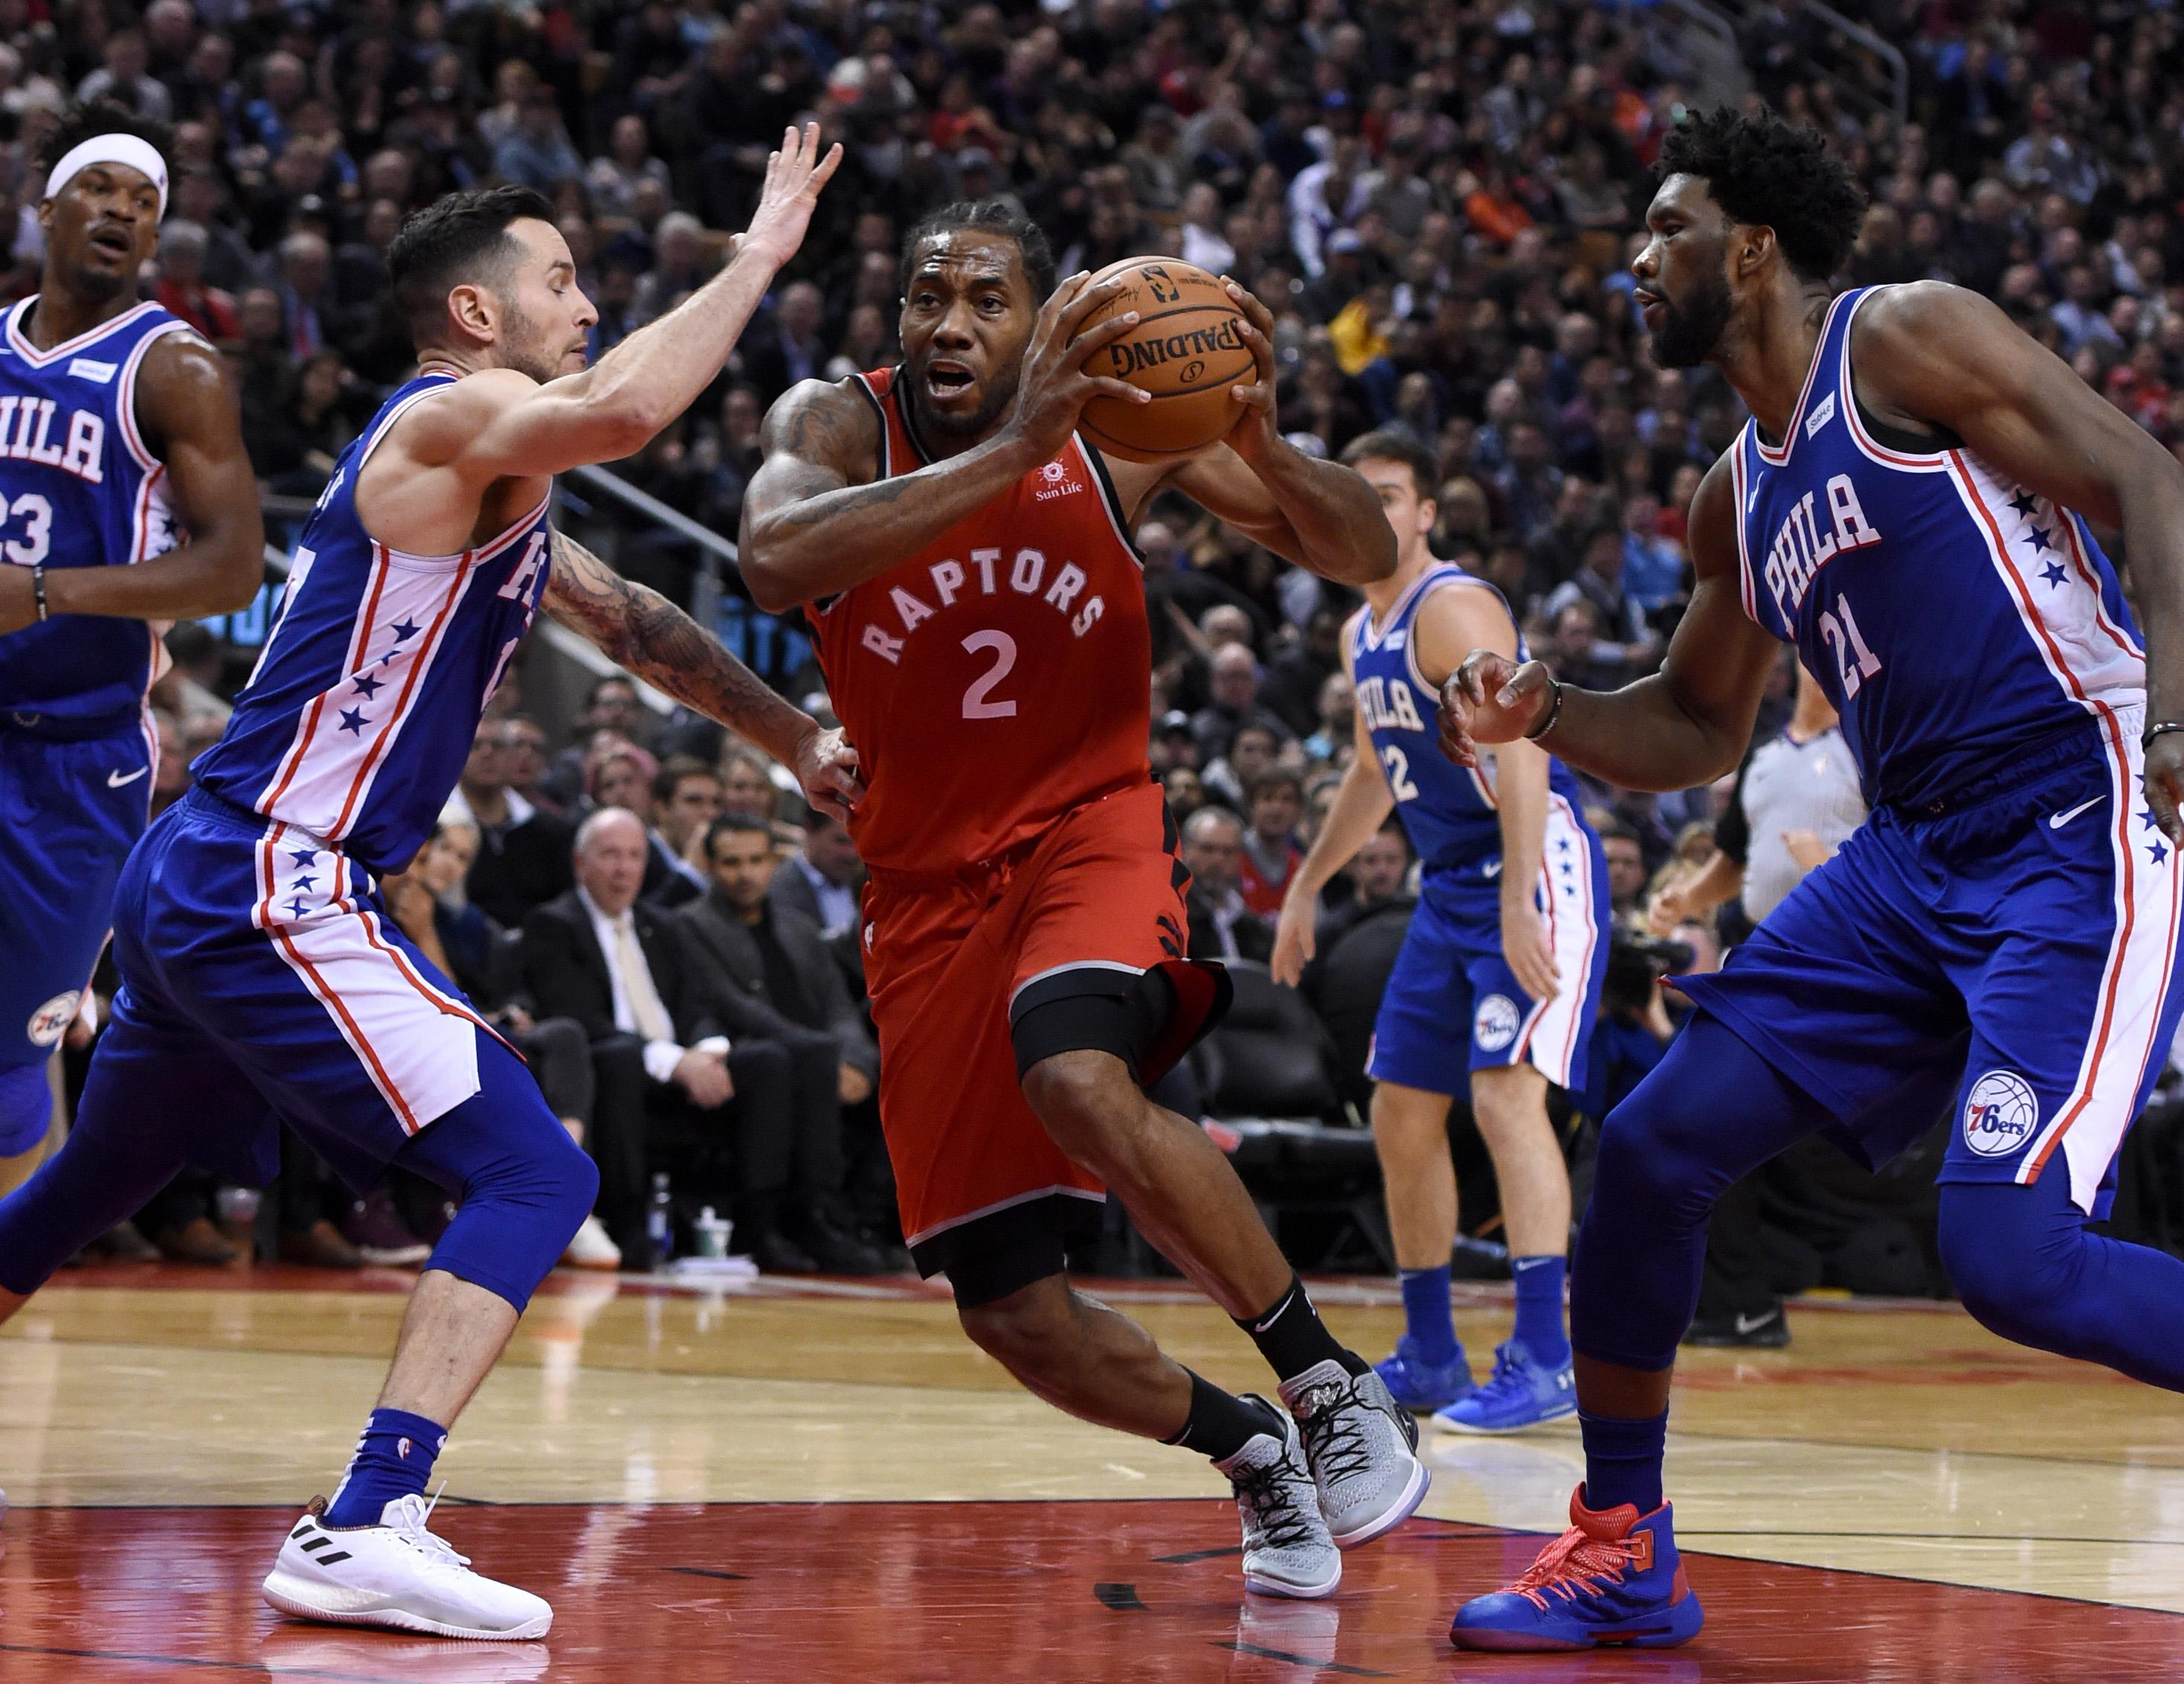 Raptors-Sixers Keys to Winning the Series